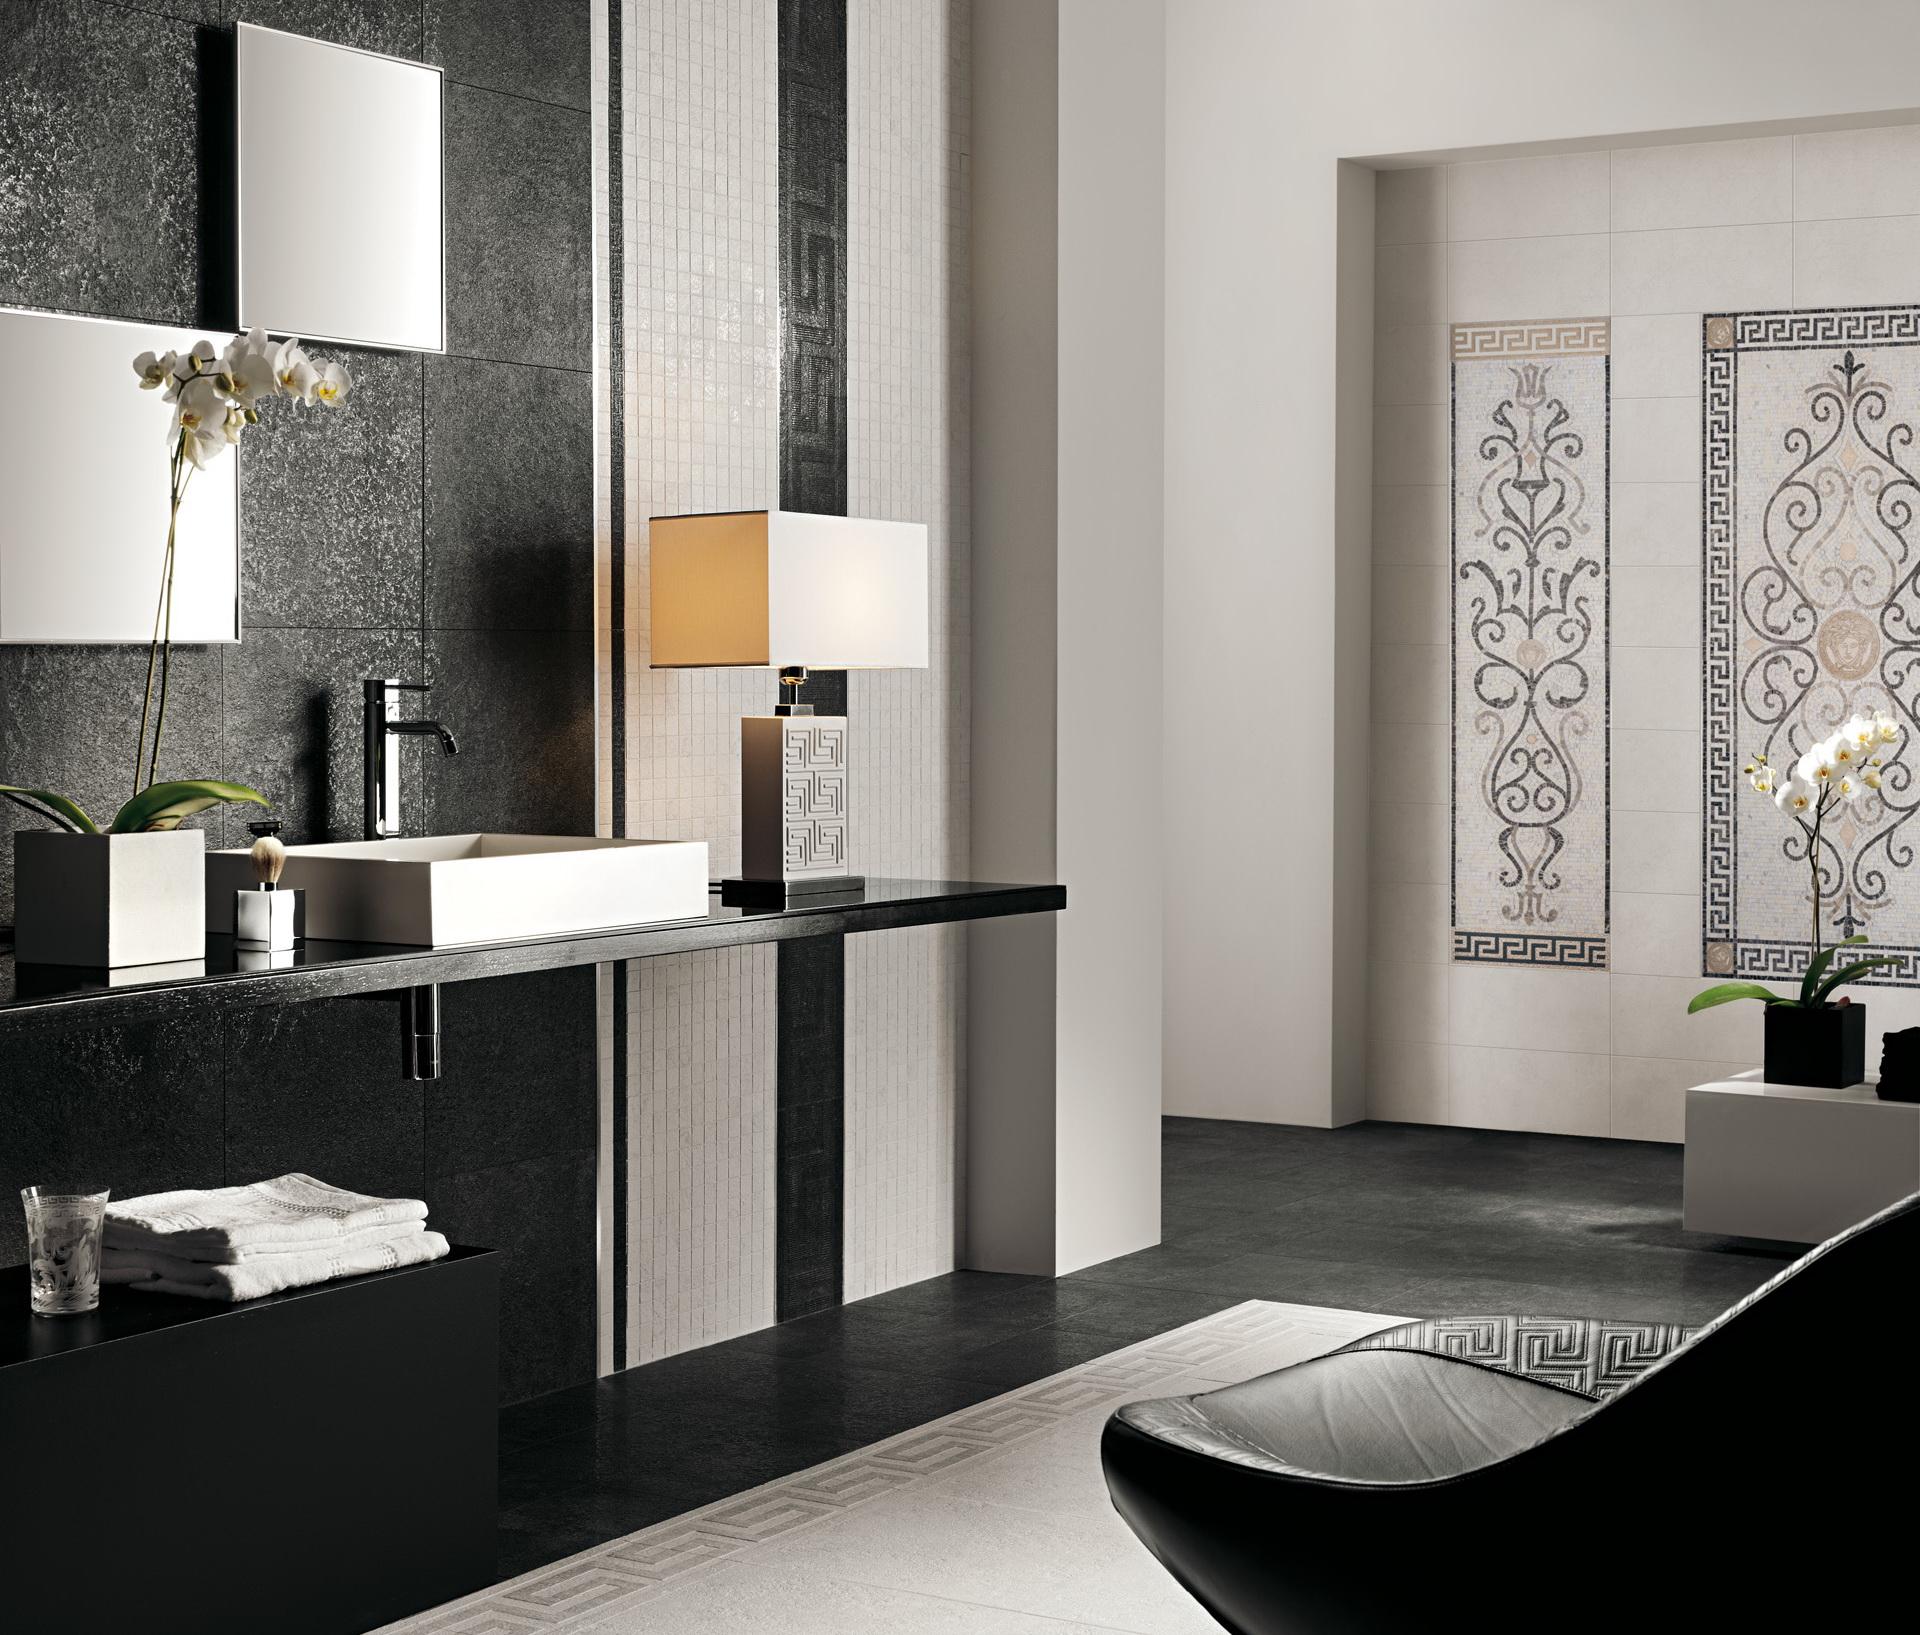 Galleria-Exclusive_10.jpg